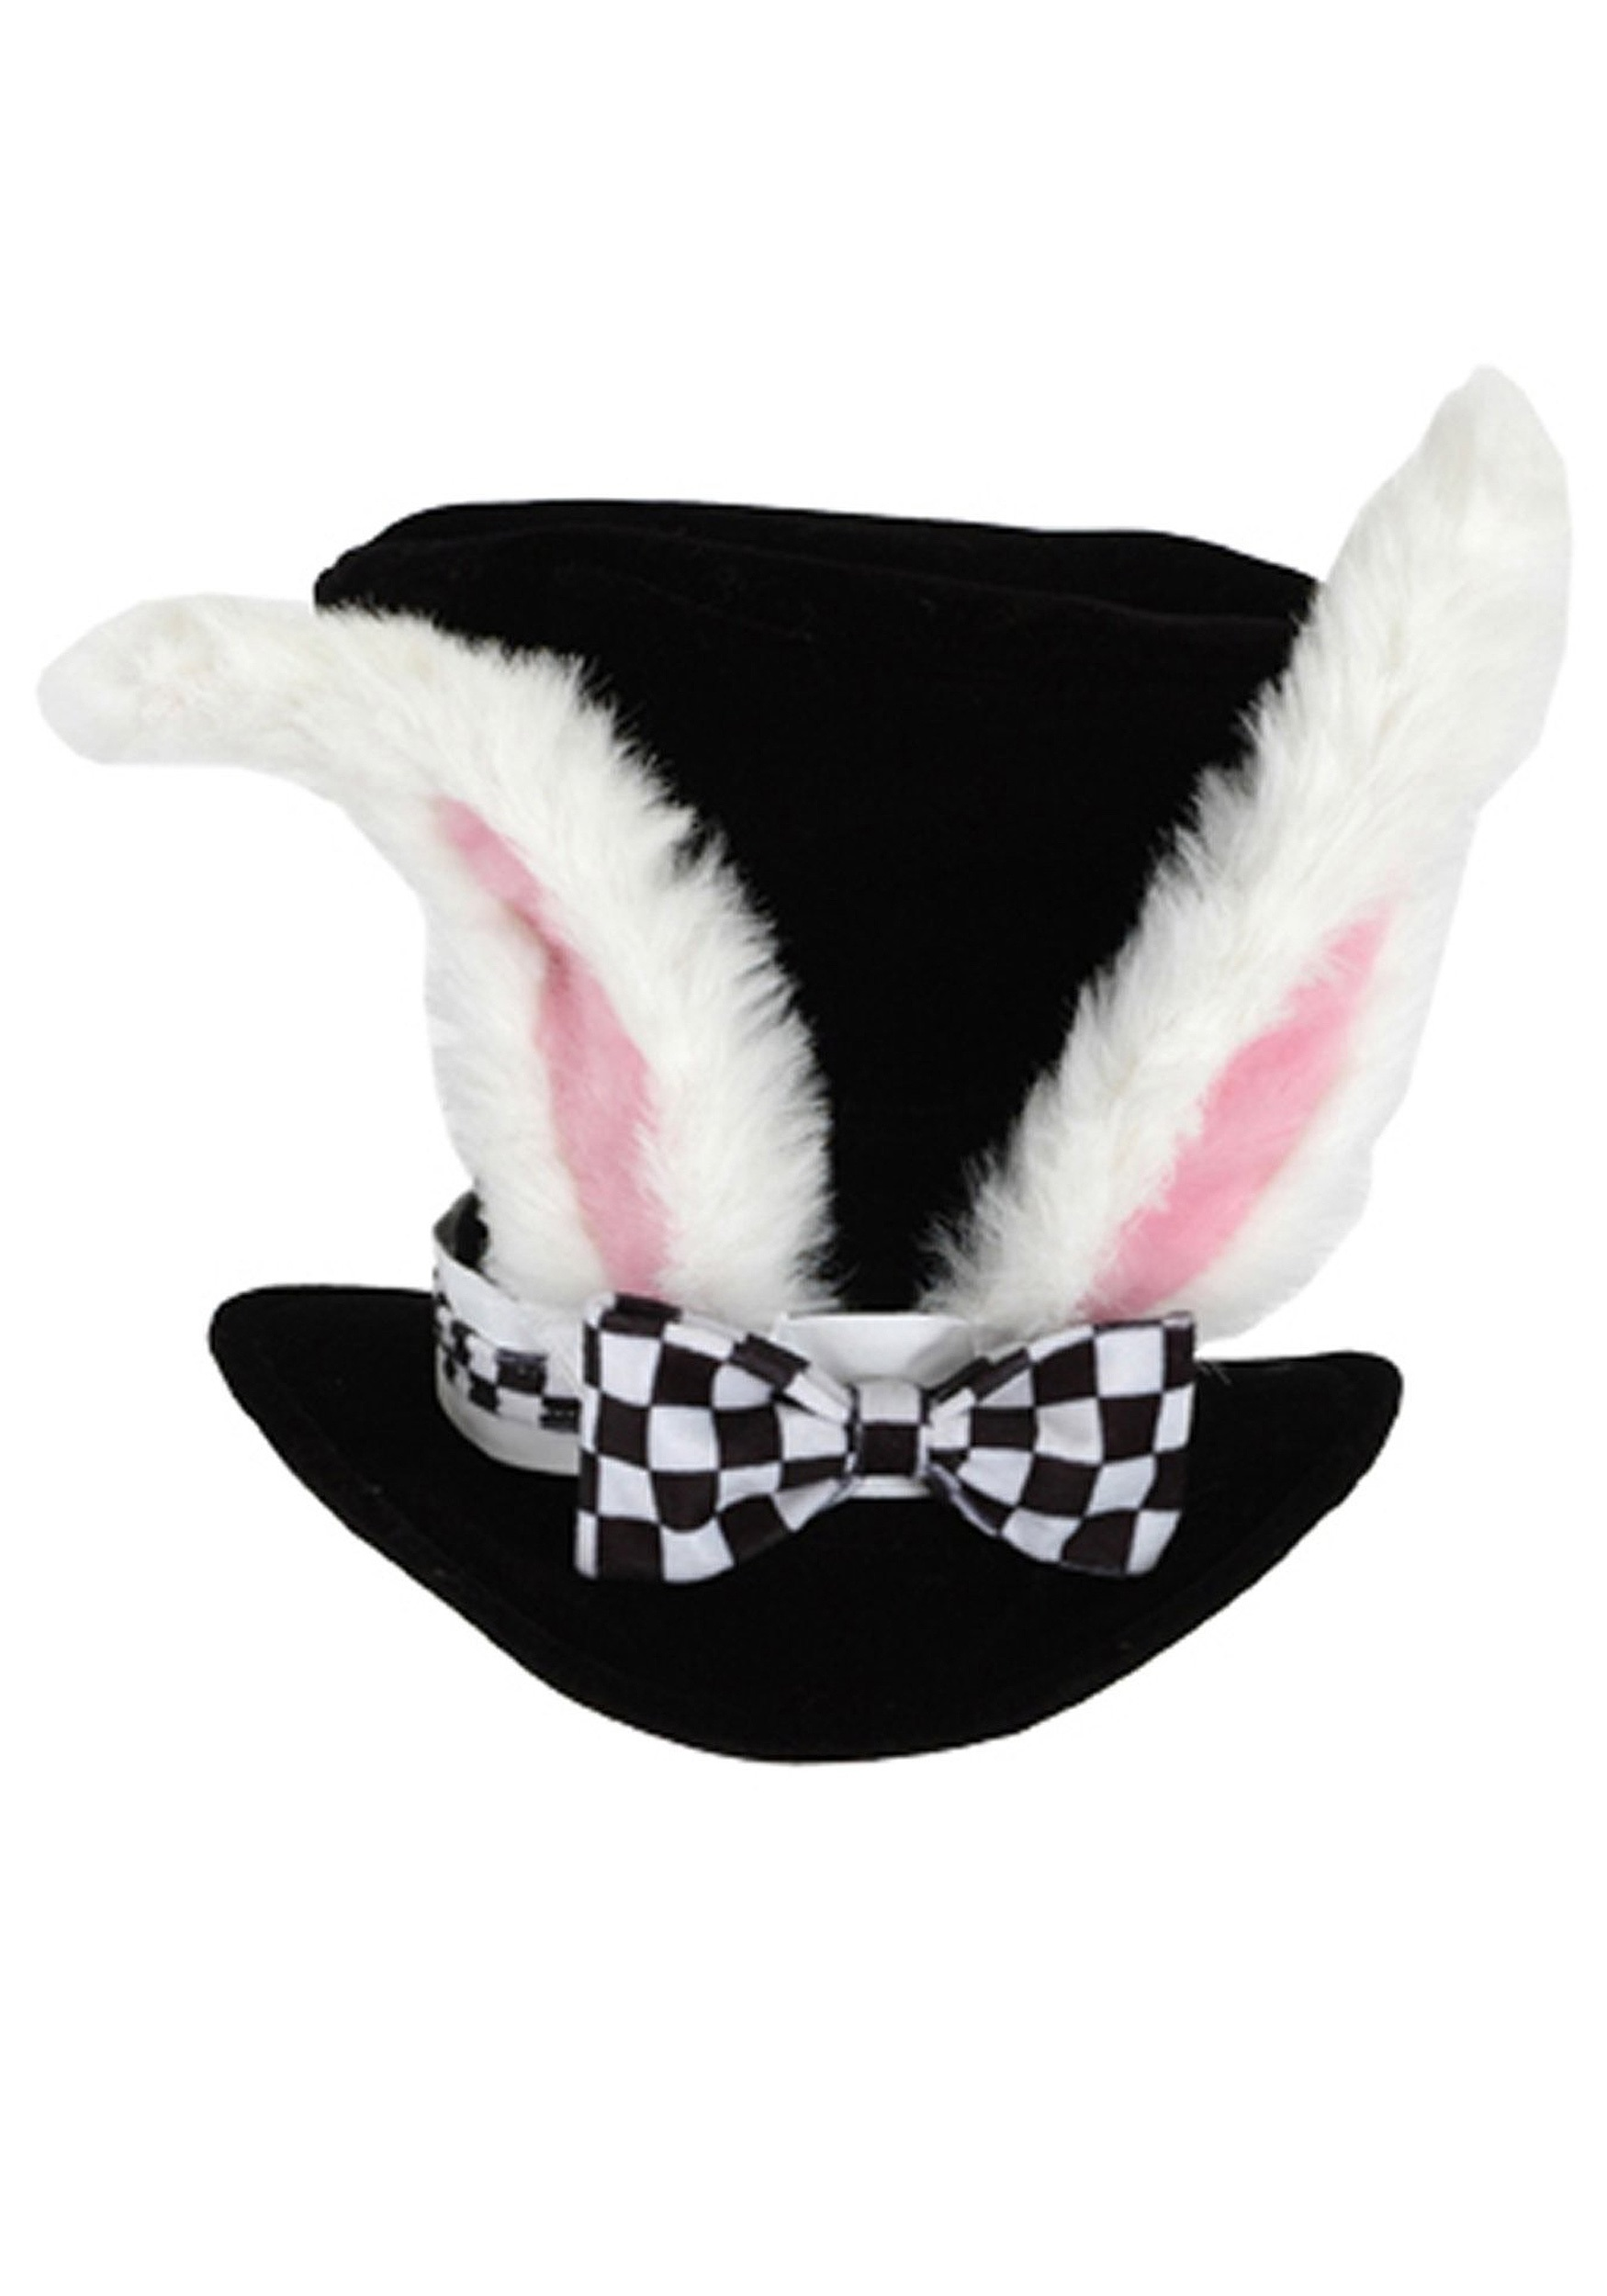 March Hare Alice In Wonderland Easter Bunny Rabbit Men Costume Ears Hat